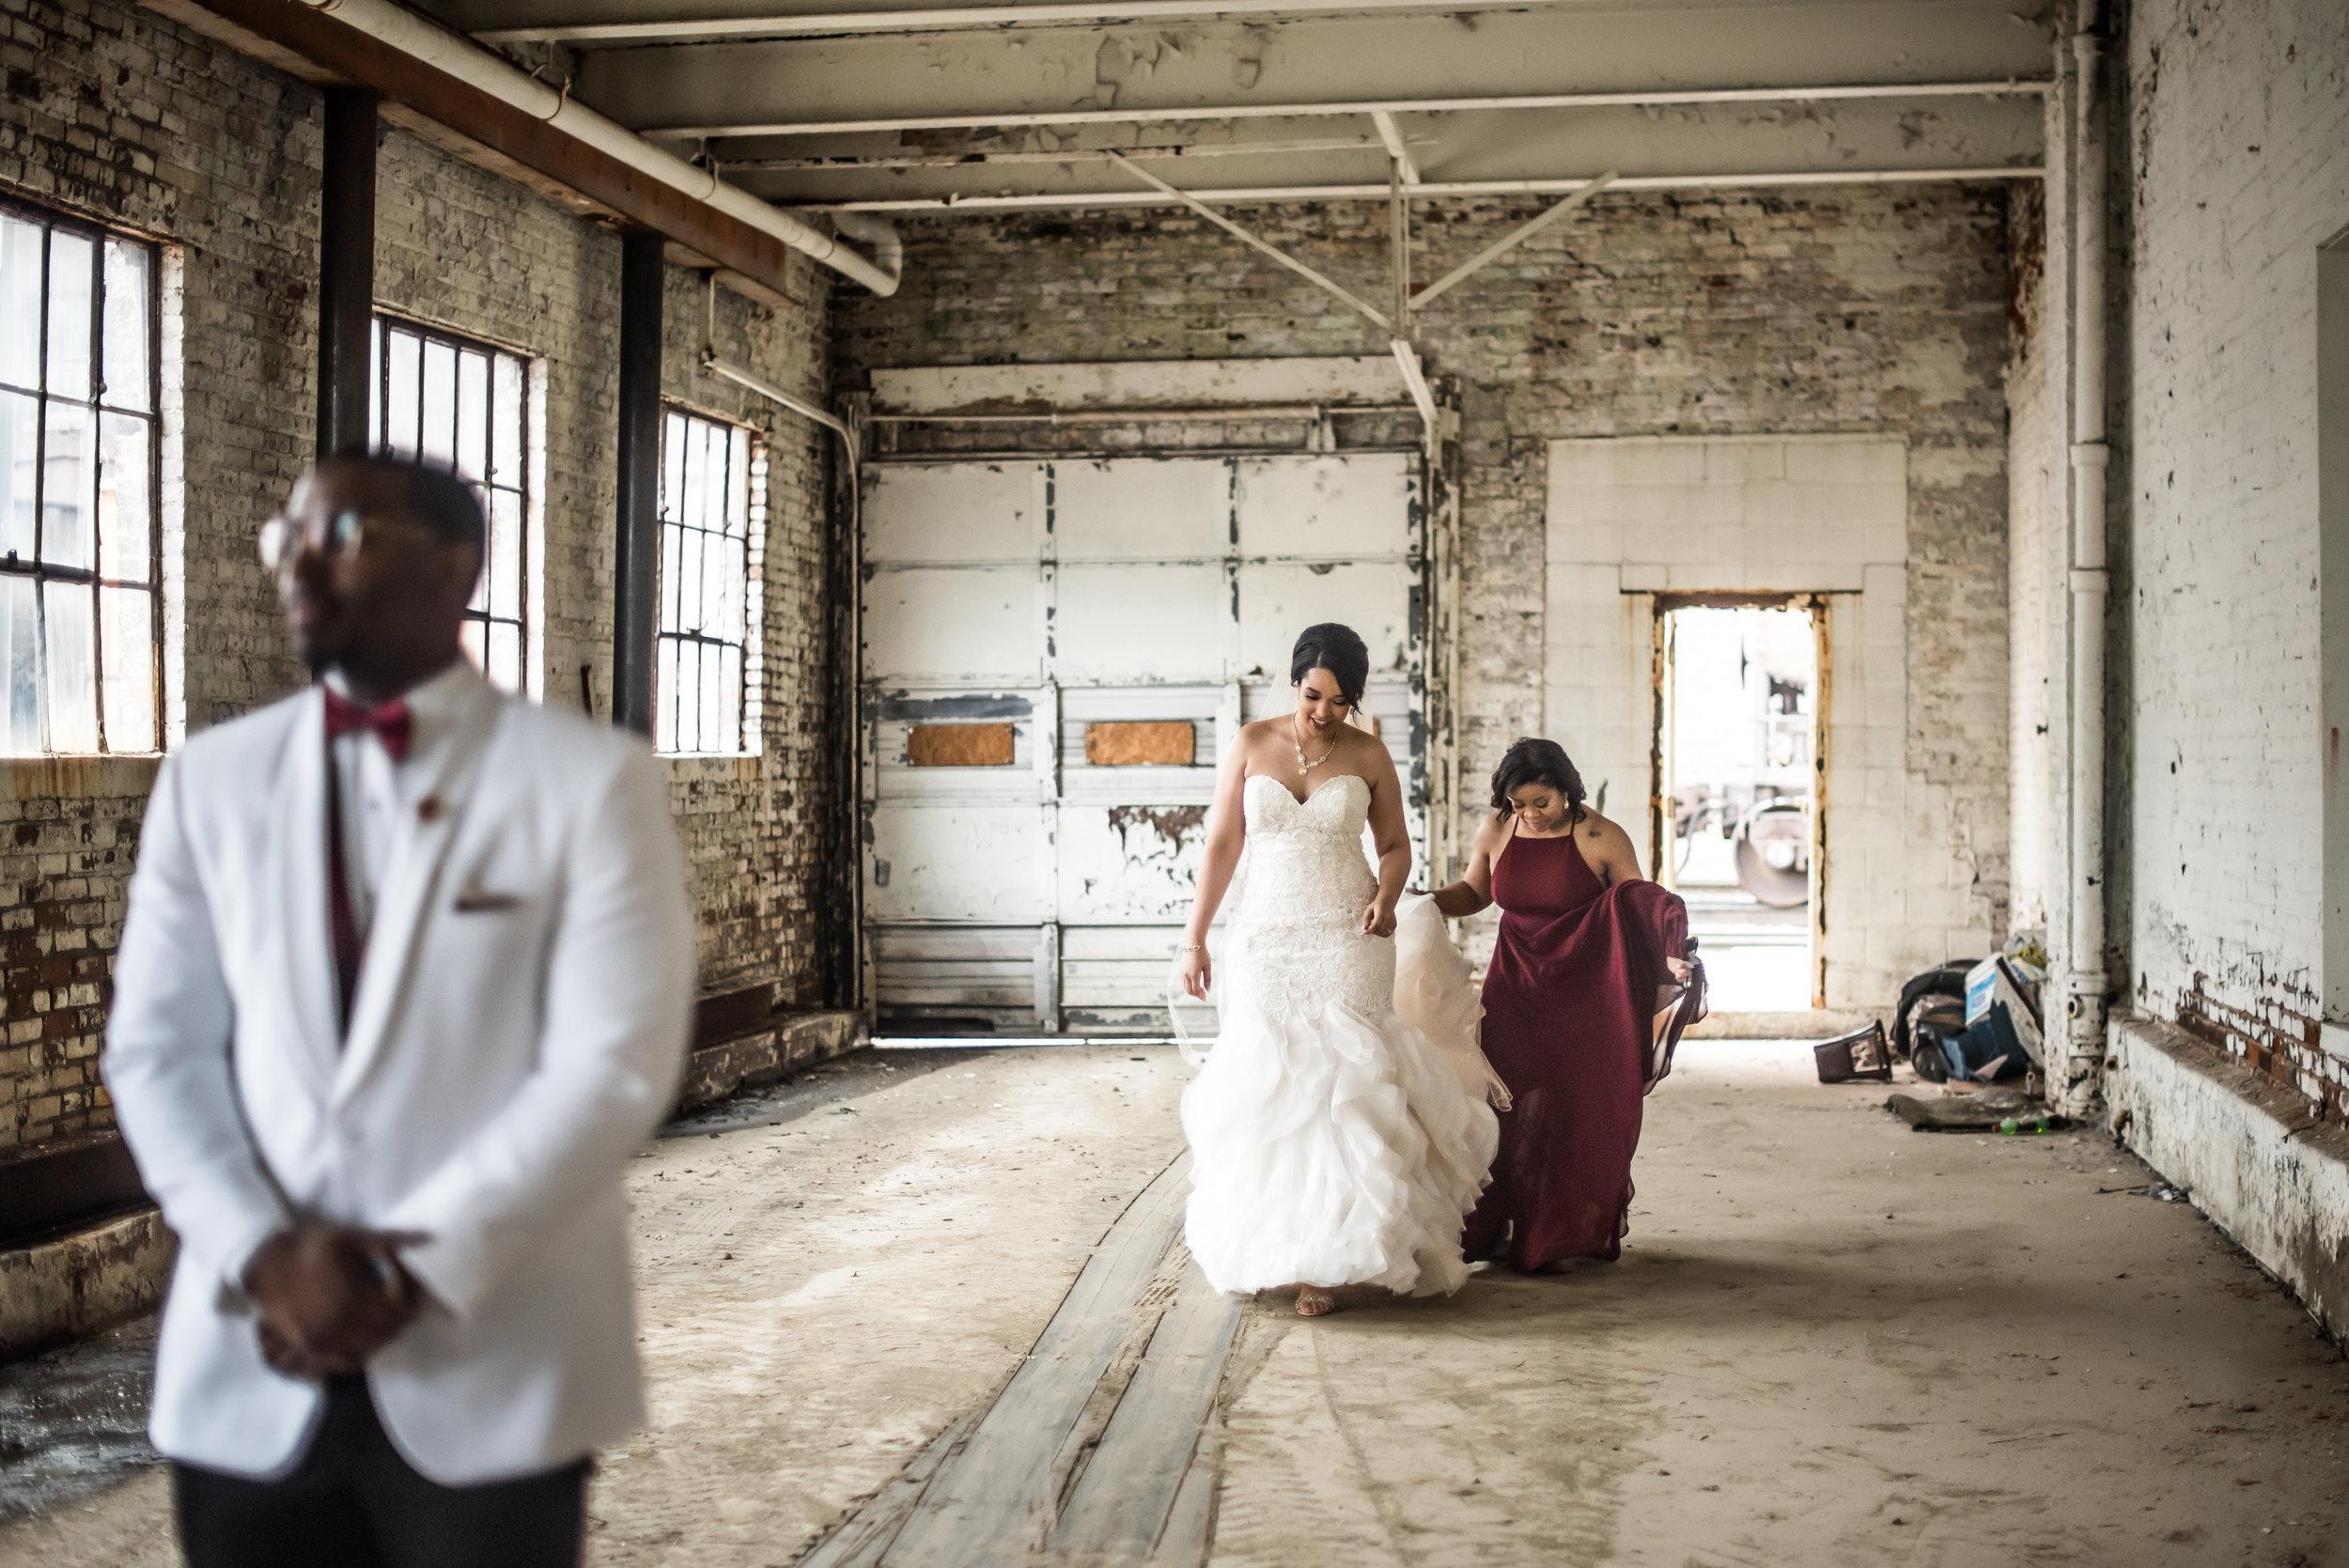 Burlington Iowa Wedding Midwest Photographer Melissa Cervantes _ Chantelle and Isaiah 104b.jpg